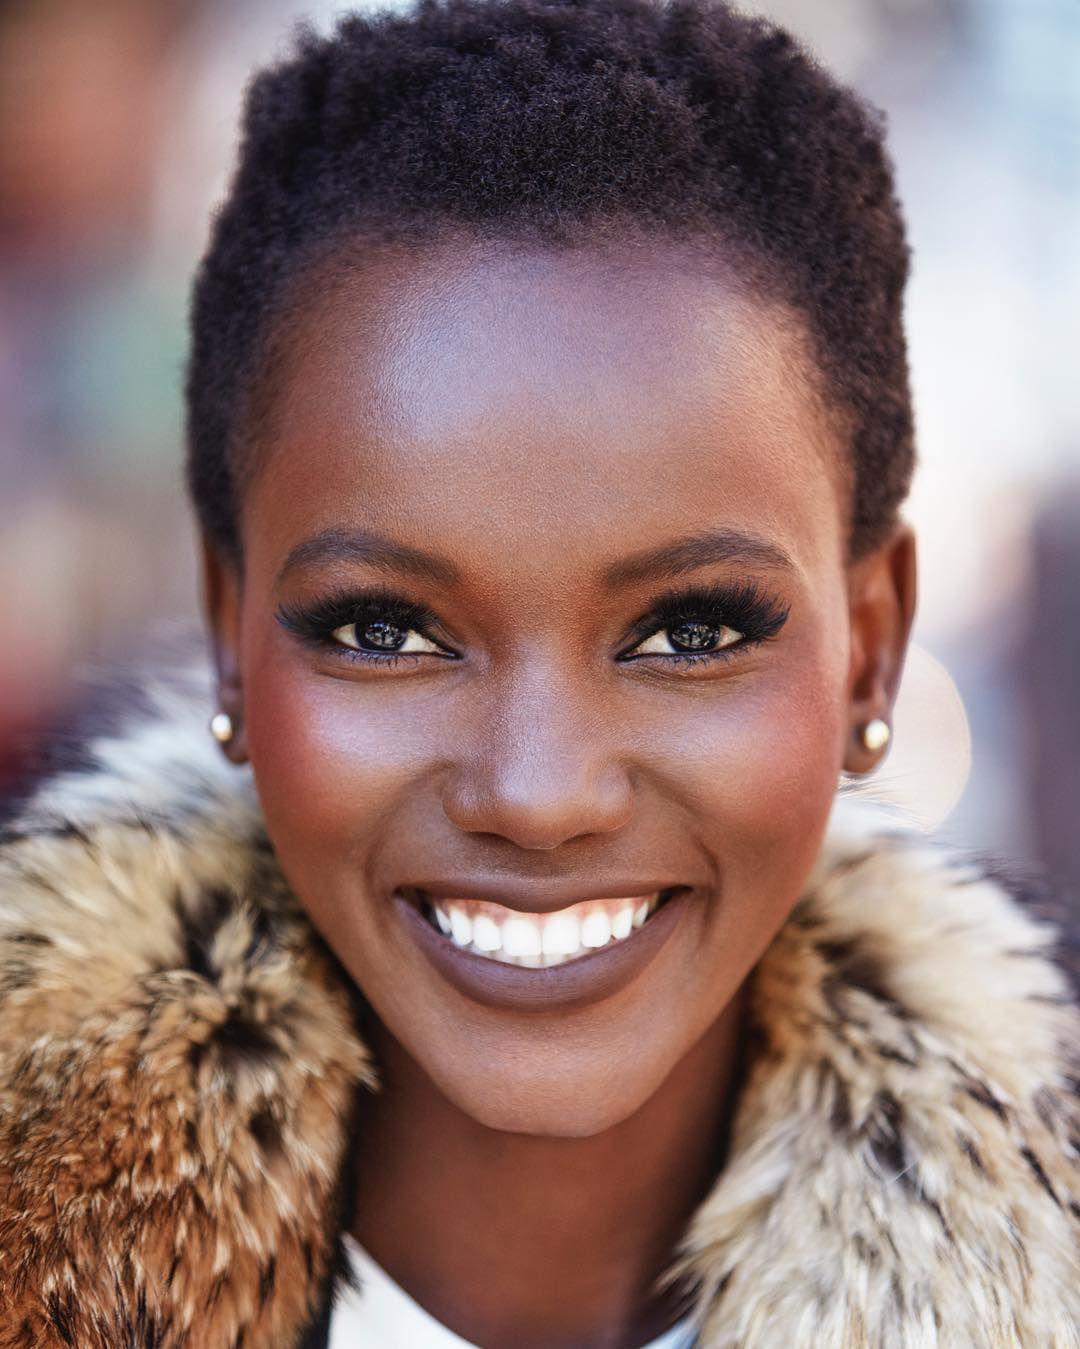 Tanzanian Model  Represented by Women Management|| Maybelline Newyork Brand Ambassador|| Snap:  Herieth